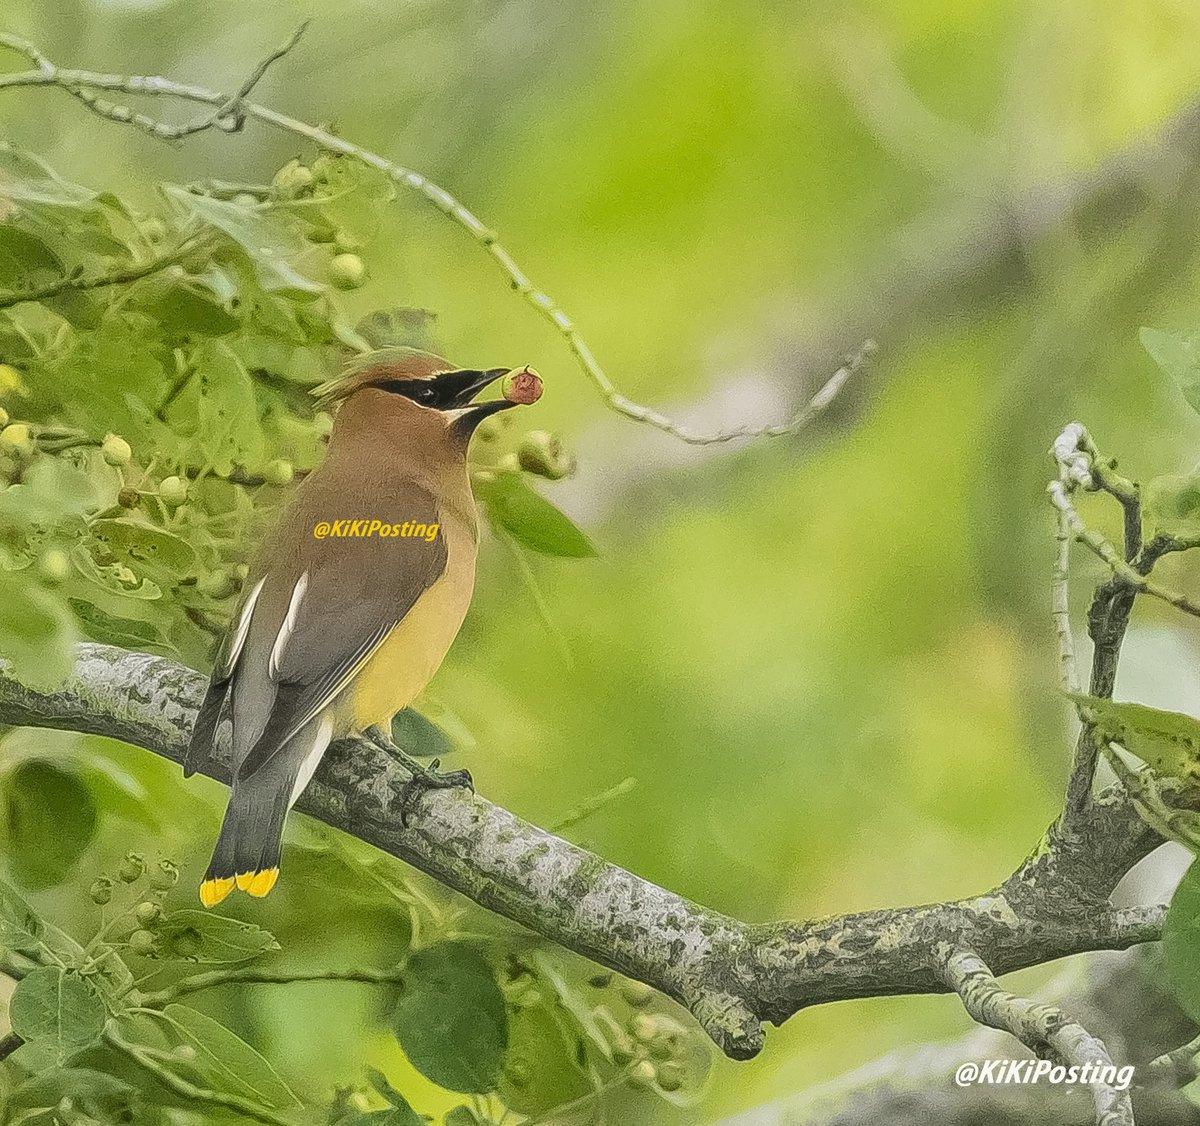 Mmmmm breakfast! #wildlifephotography #wildlife #birds #birdphotography #Peace #harmony #tranquility #photography #nature #NaturePhotography #naturelovers #TwitterNatureCommunity #berries #berry #breakfast https://t.co/Sn9VNJggI3